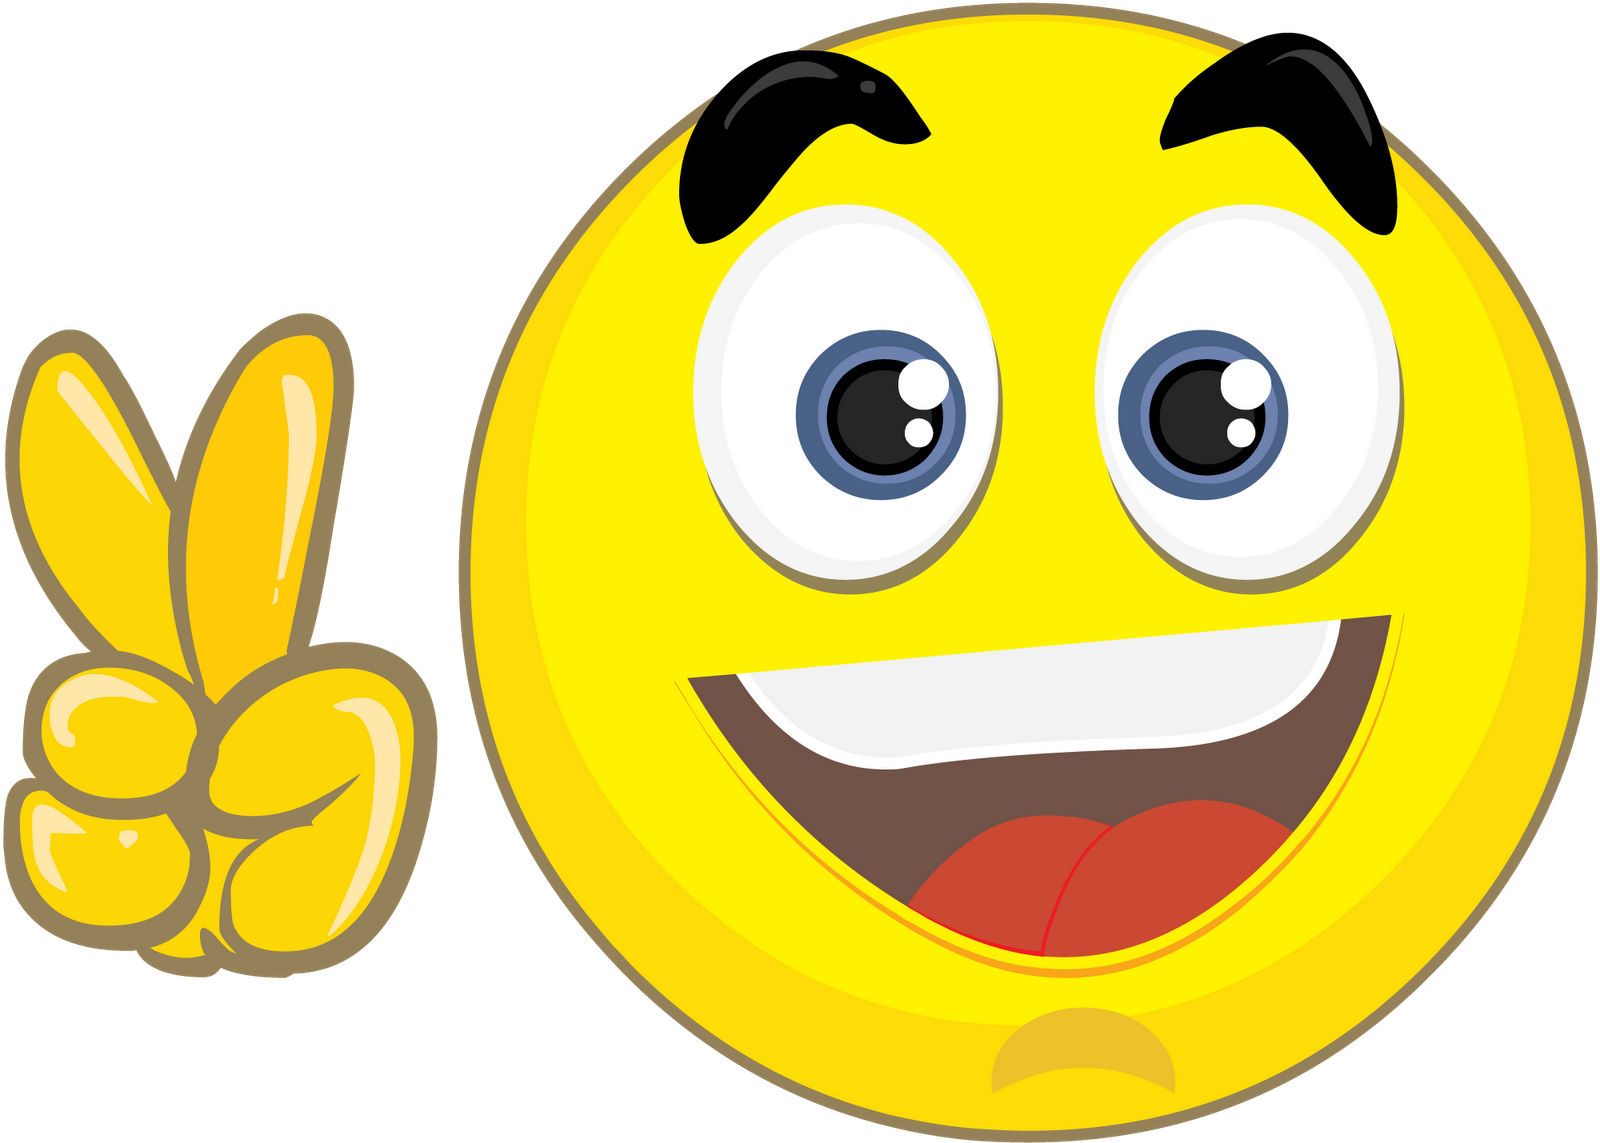 Smile Png & Free Smile.png Transparent I #543610.